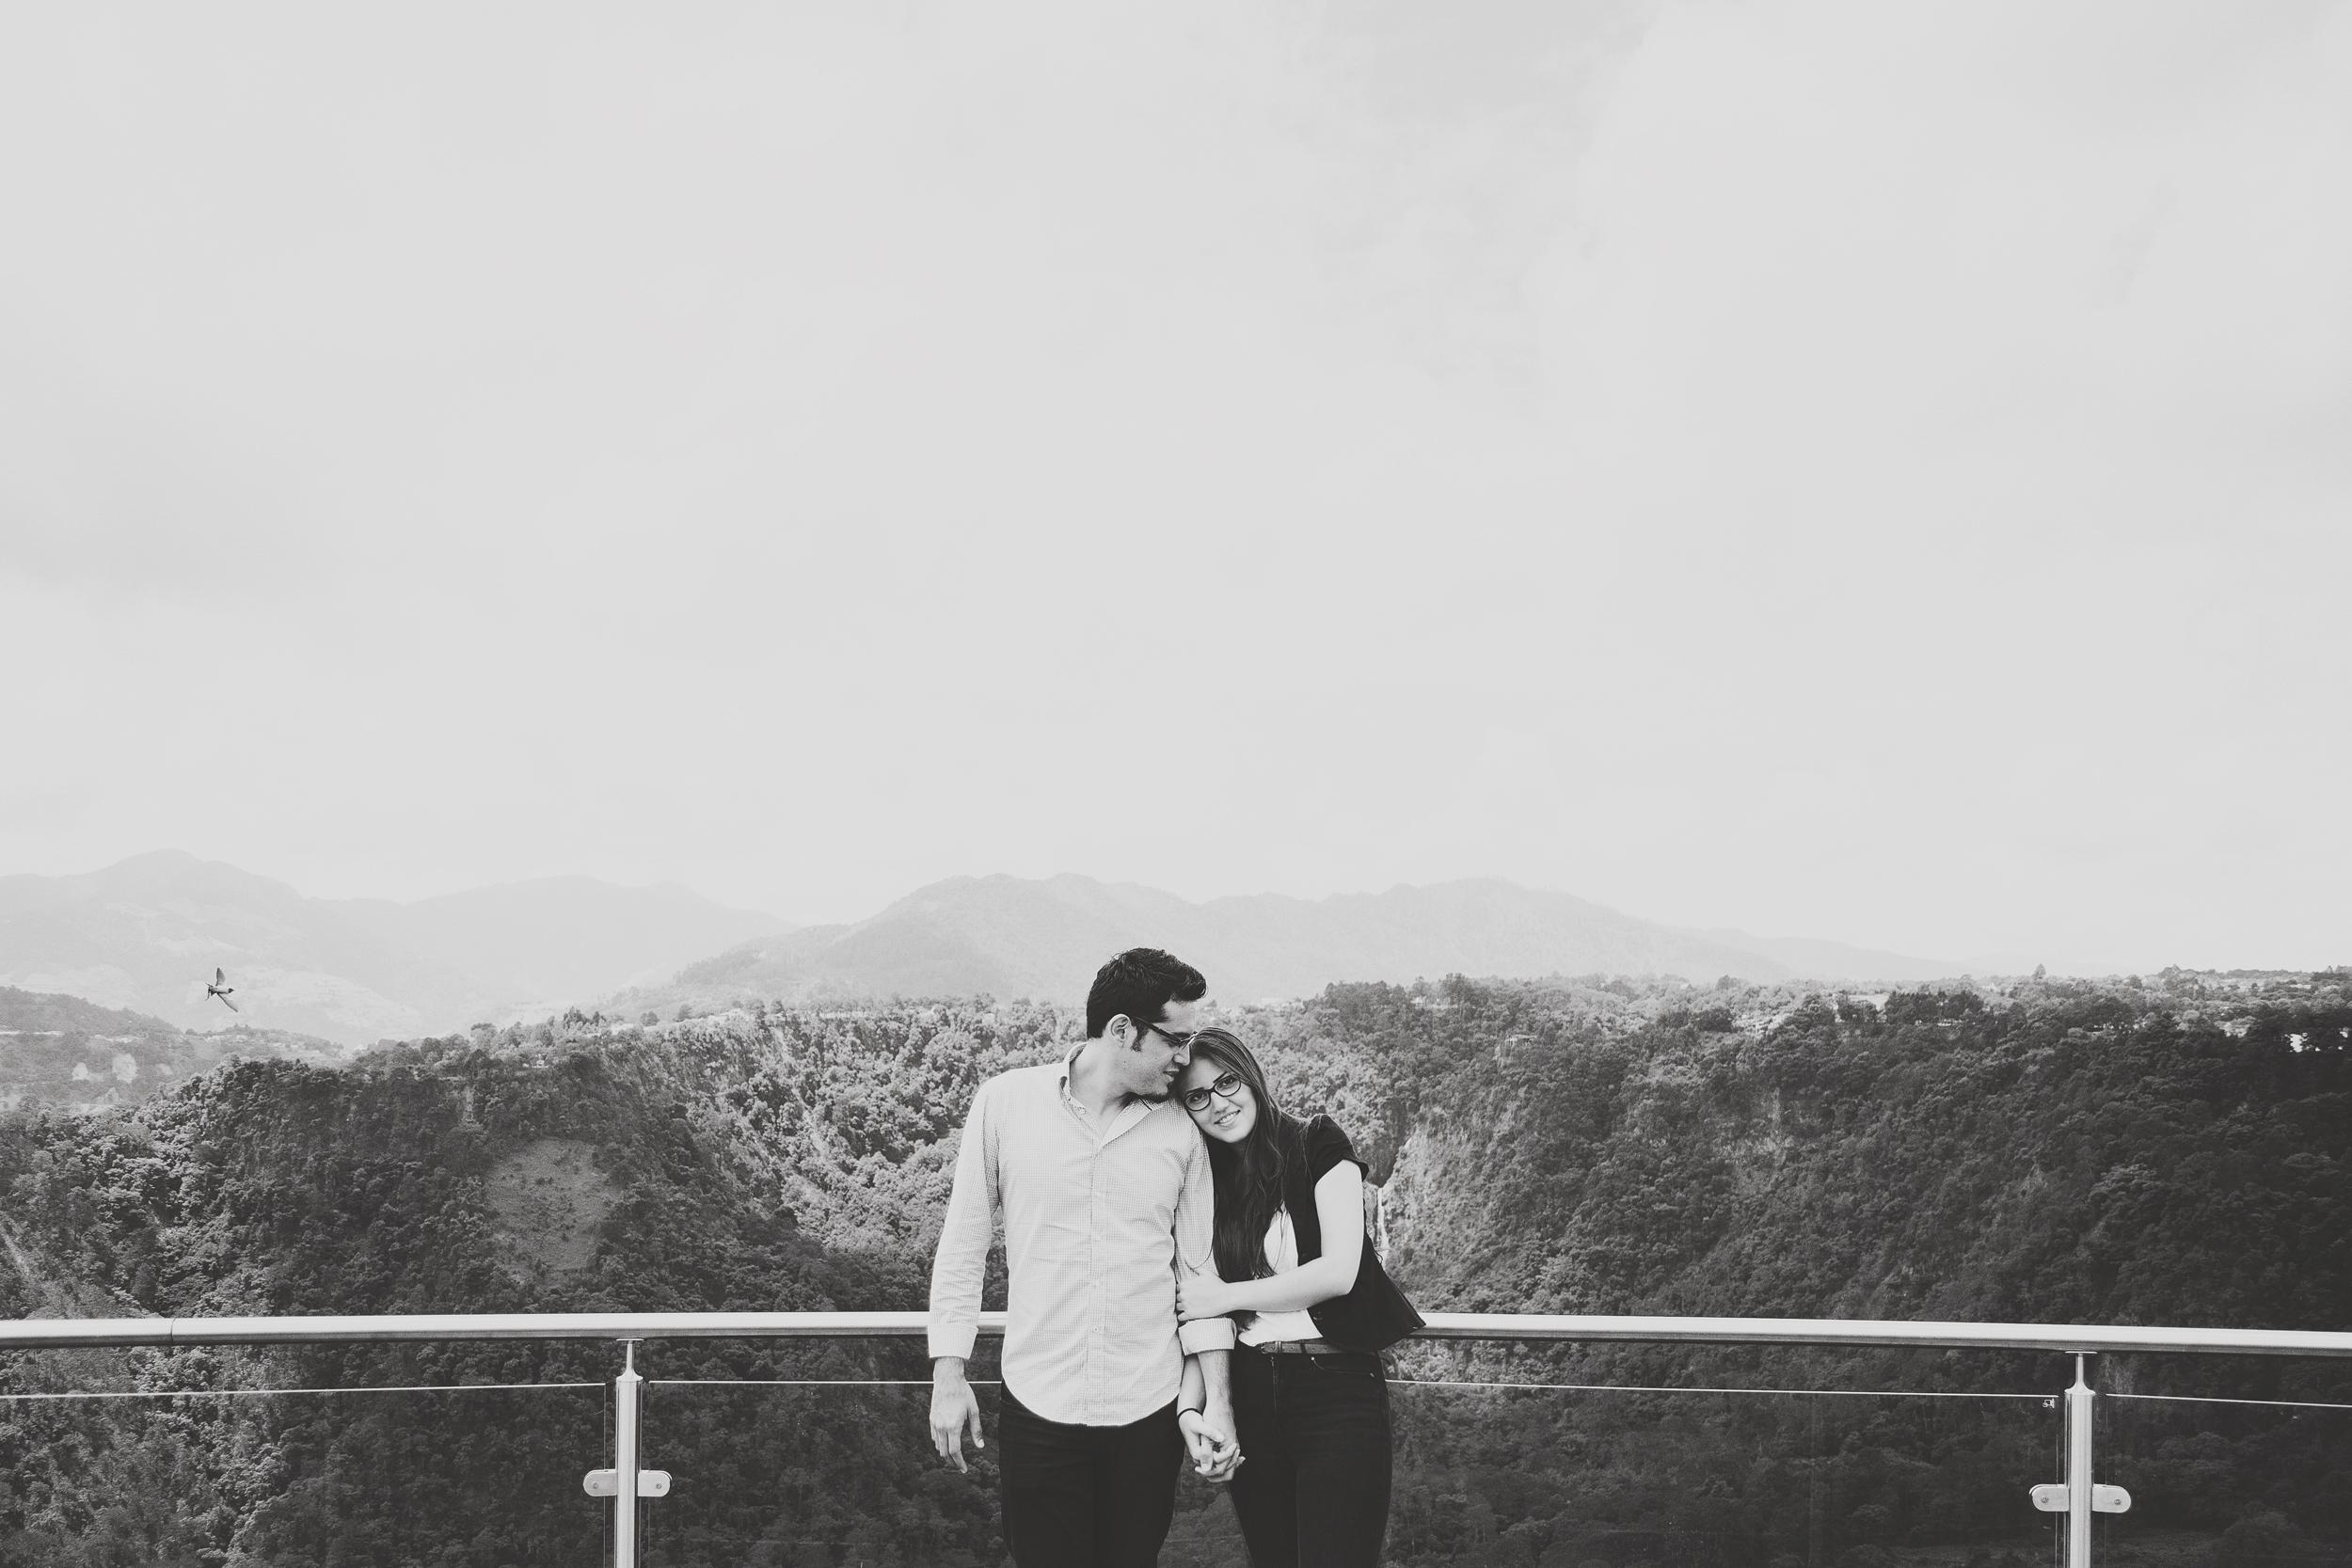 Rodi+Amelie Stone Valley Engagement (13).jpg